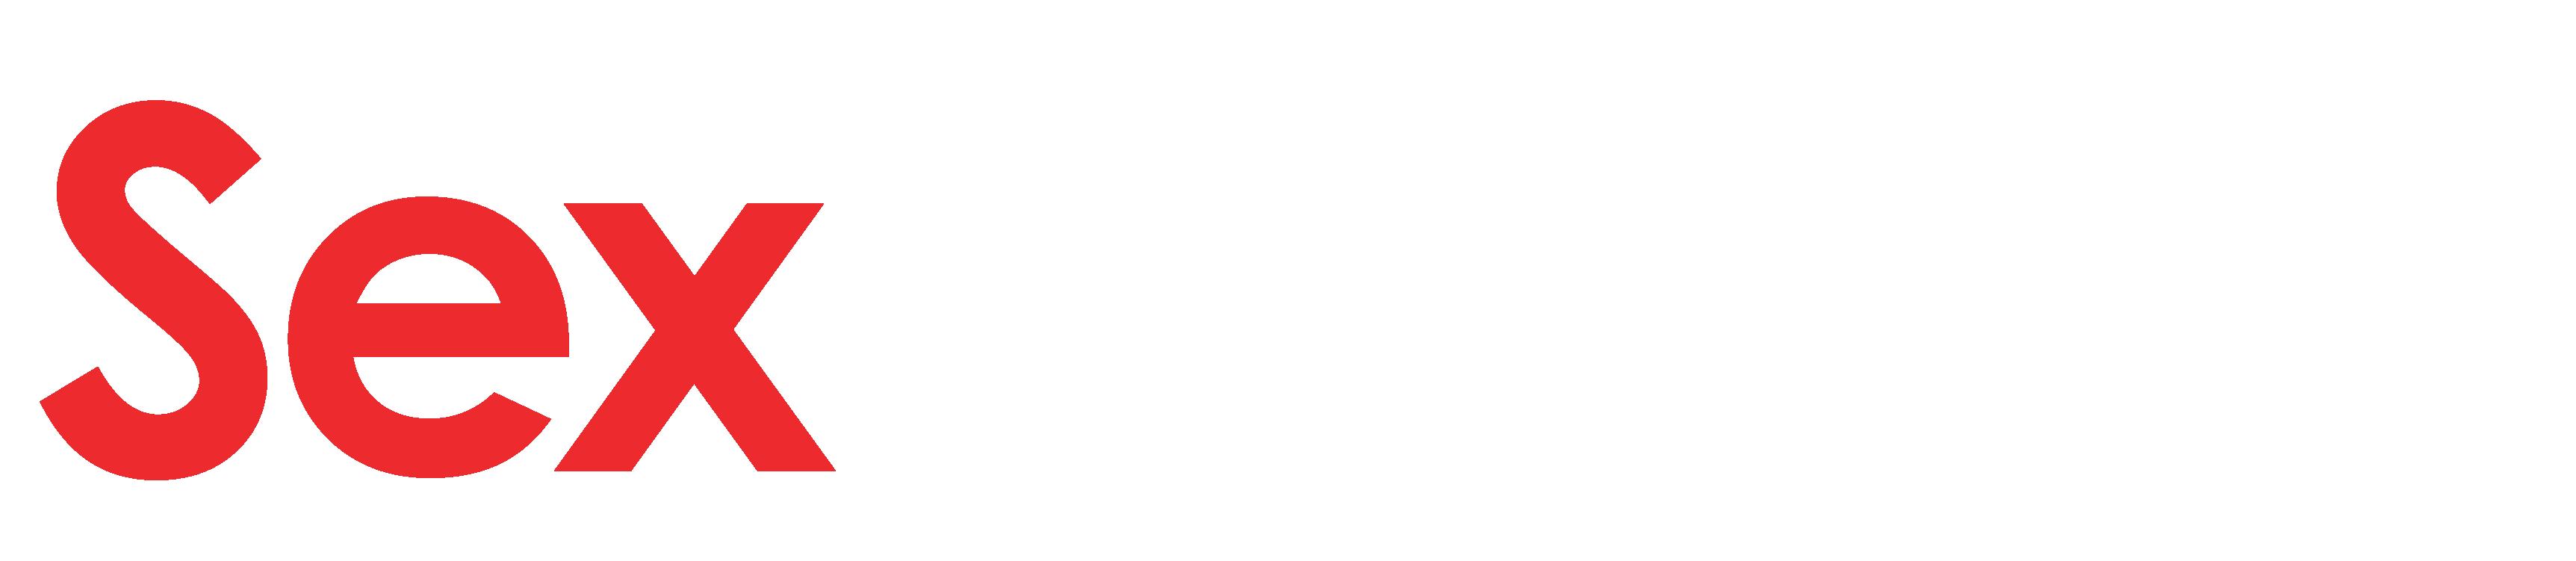 SexDrive.com logo